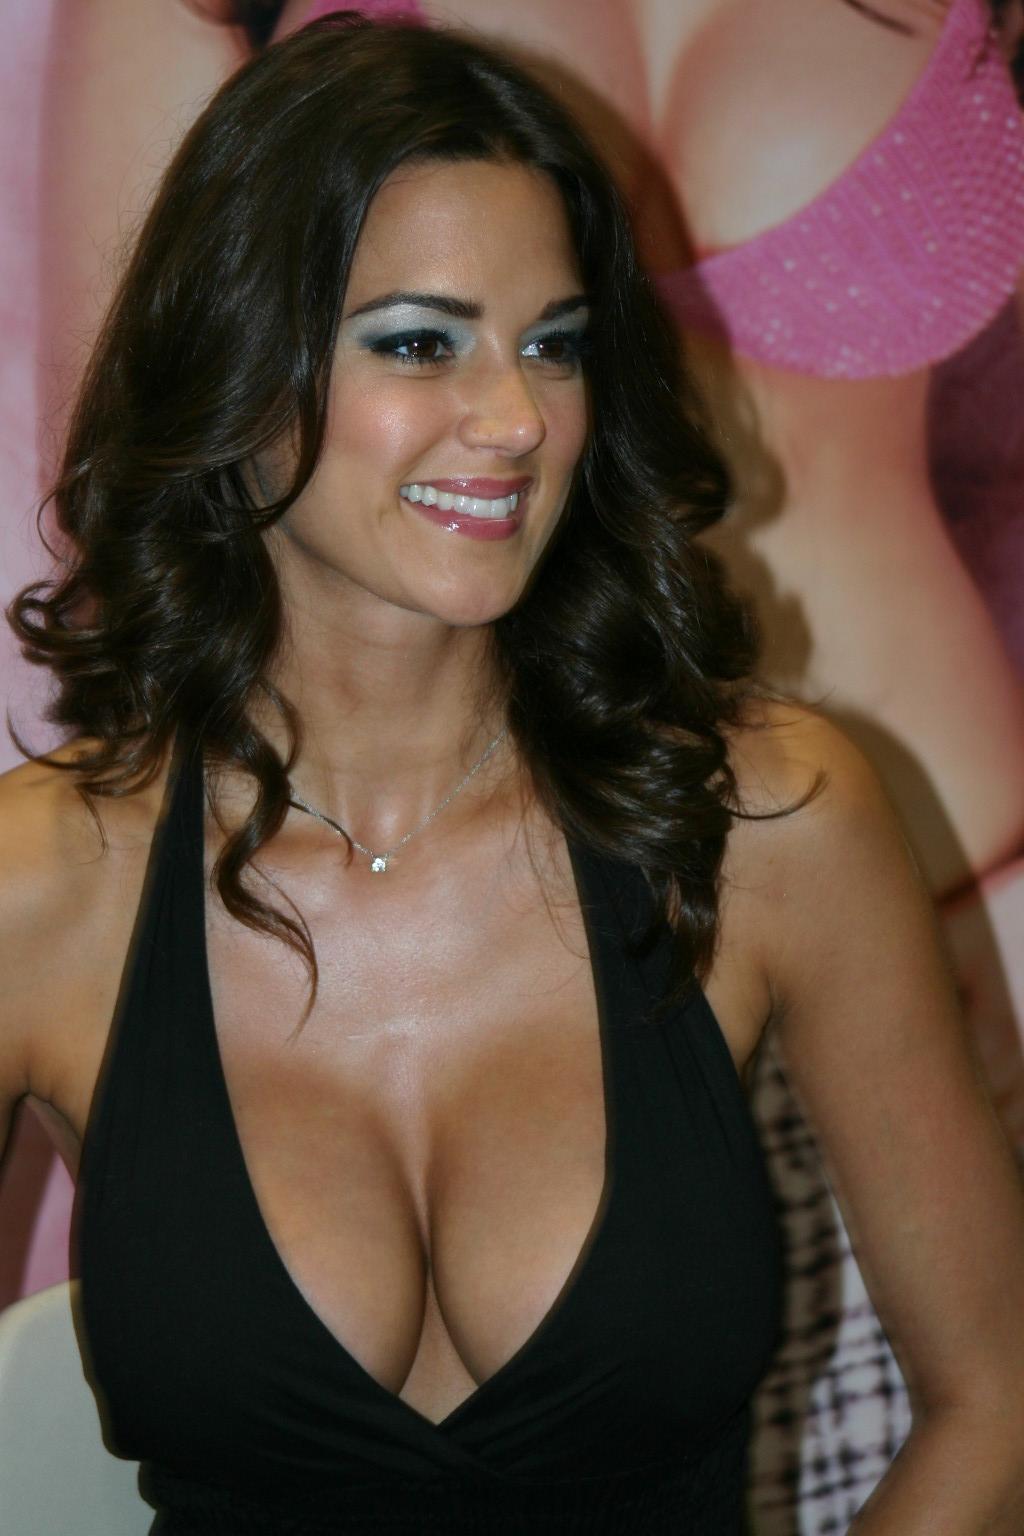 http://www.geekson.com/images/comic-con%202006%20pics/Playboy%20Playmate%20Tiffany%20Taylor.JPG